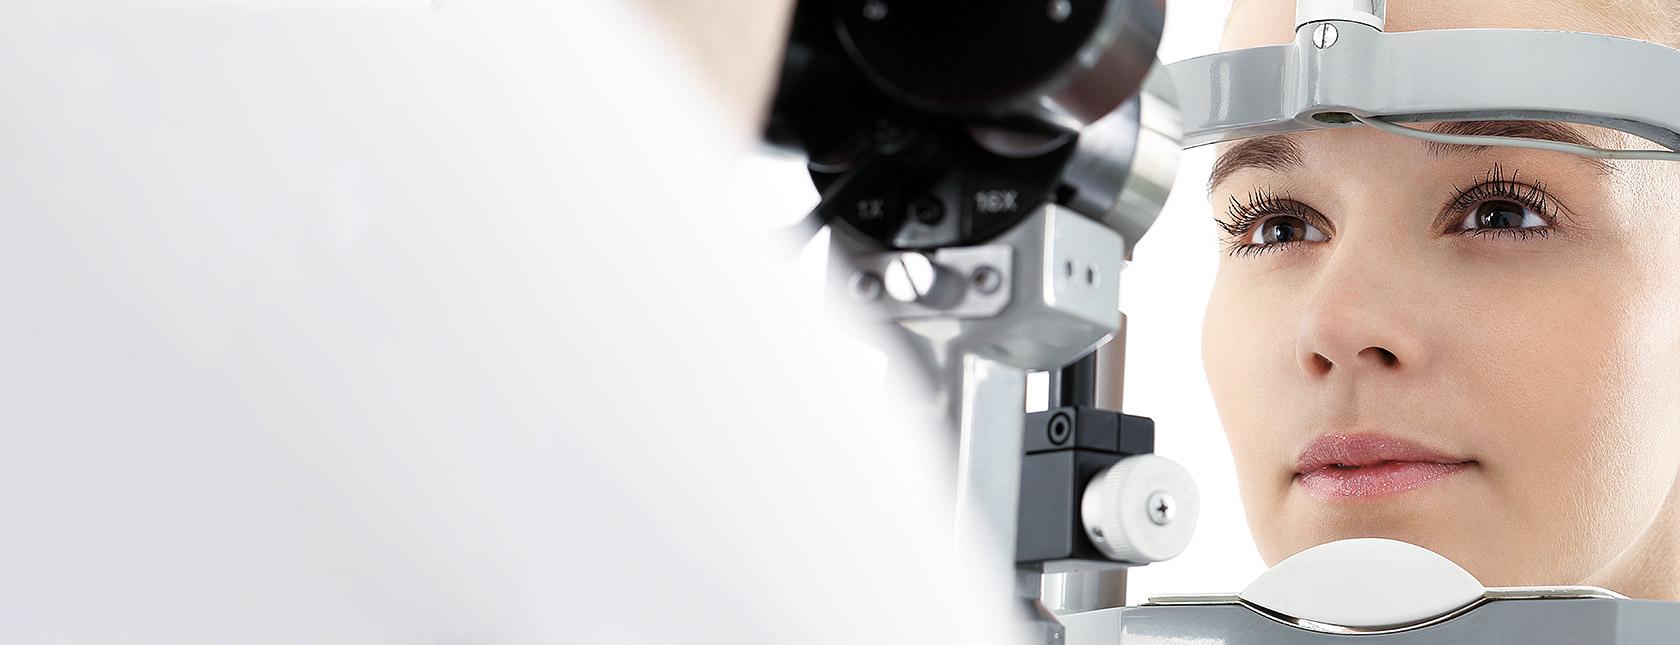 starting glaucoma treatm alternative - 1680×645